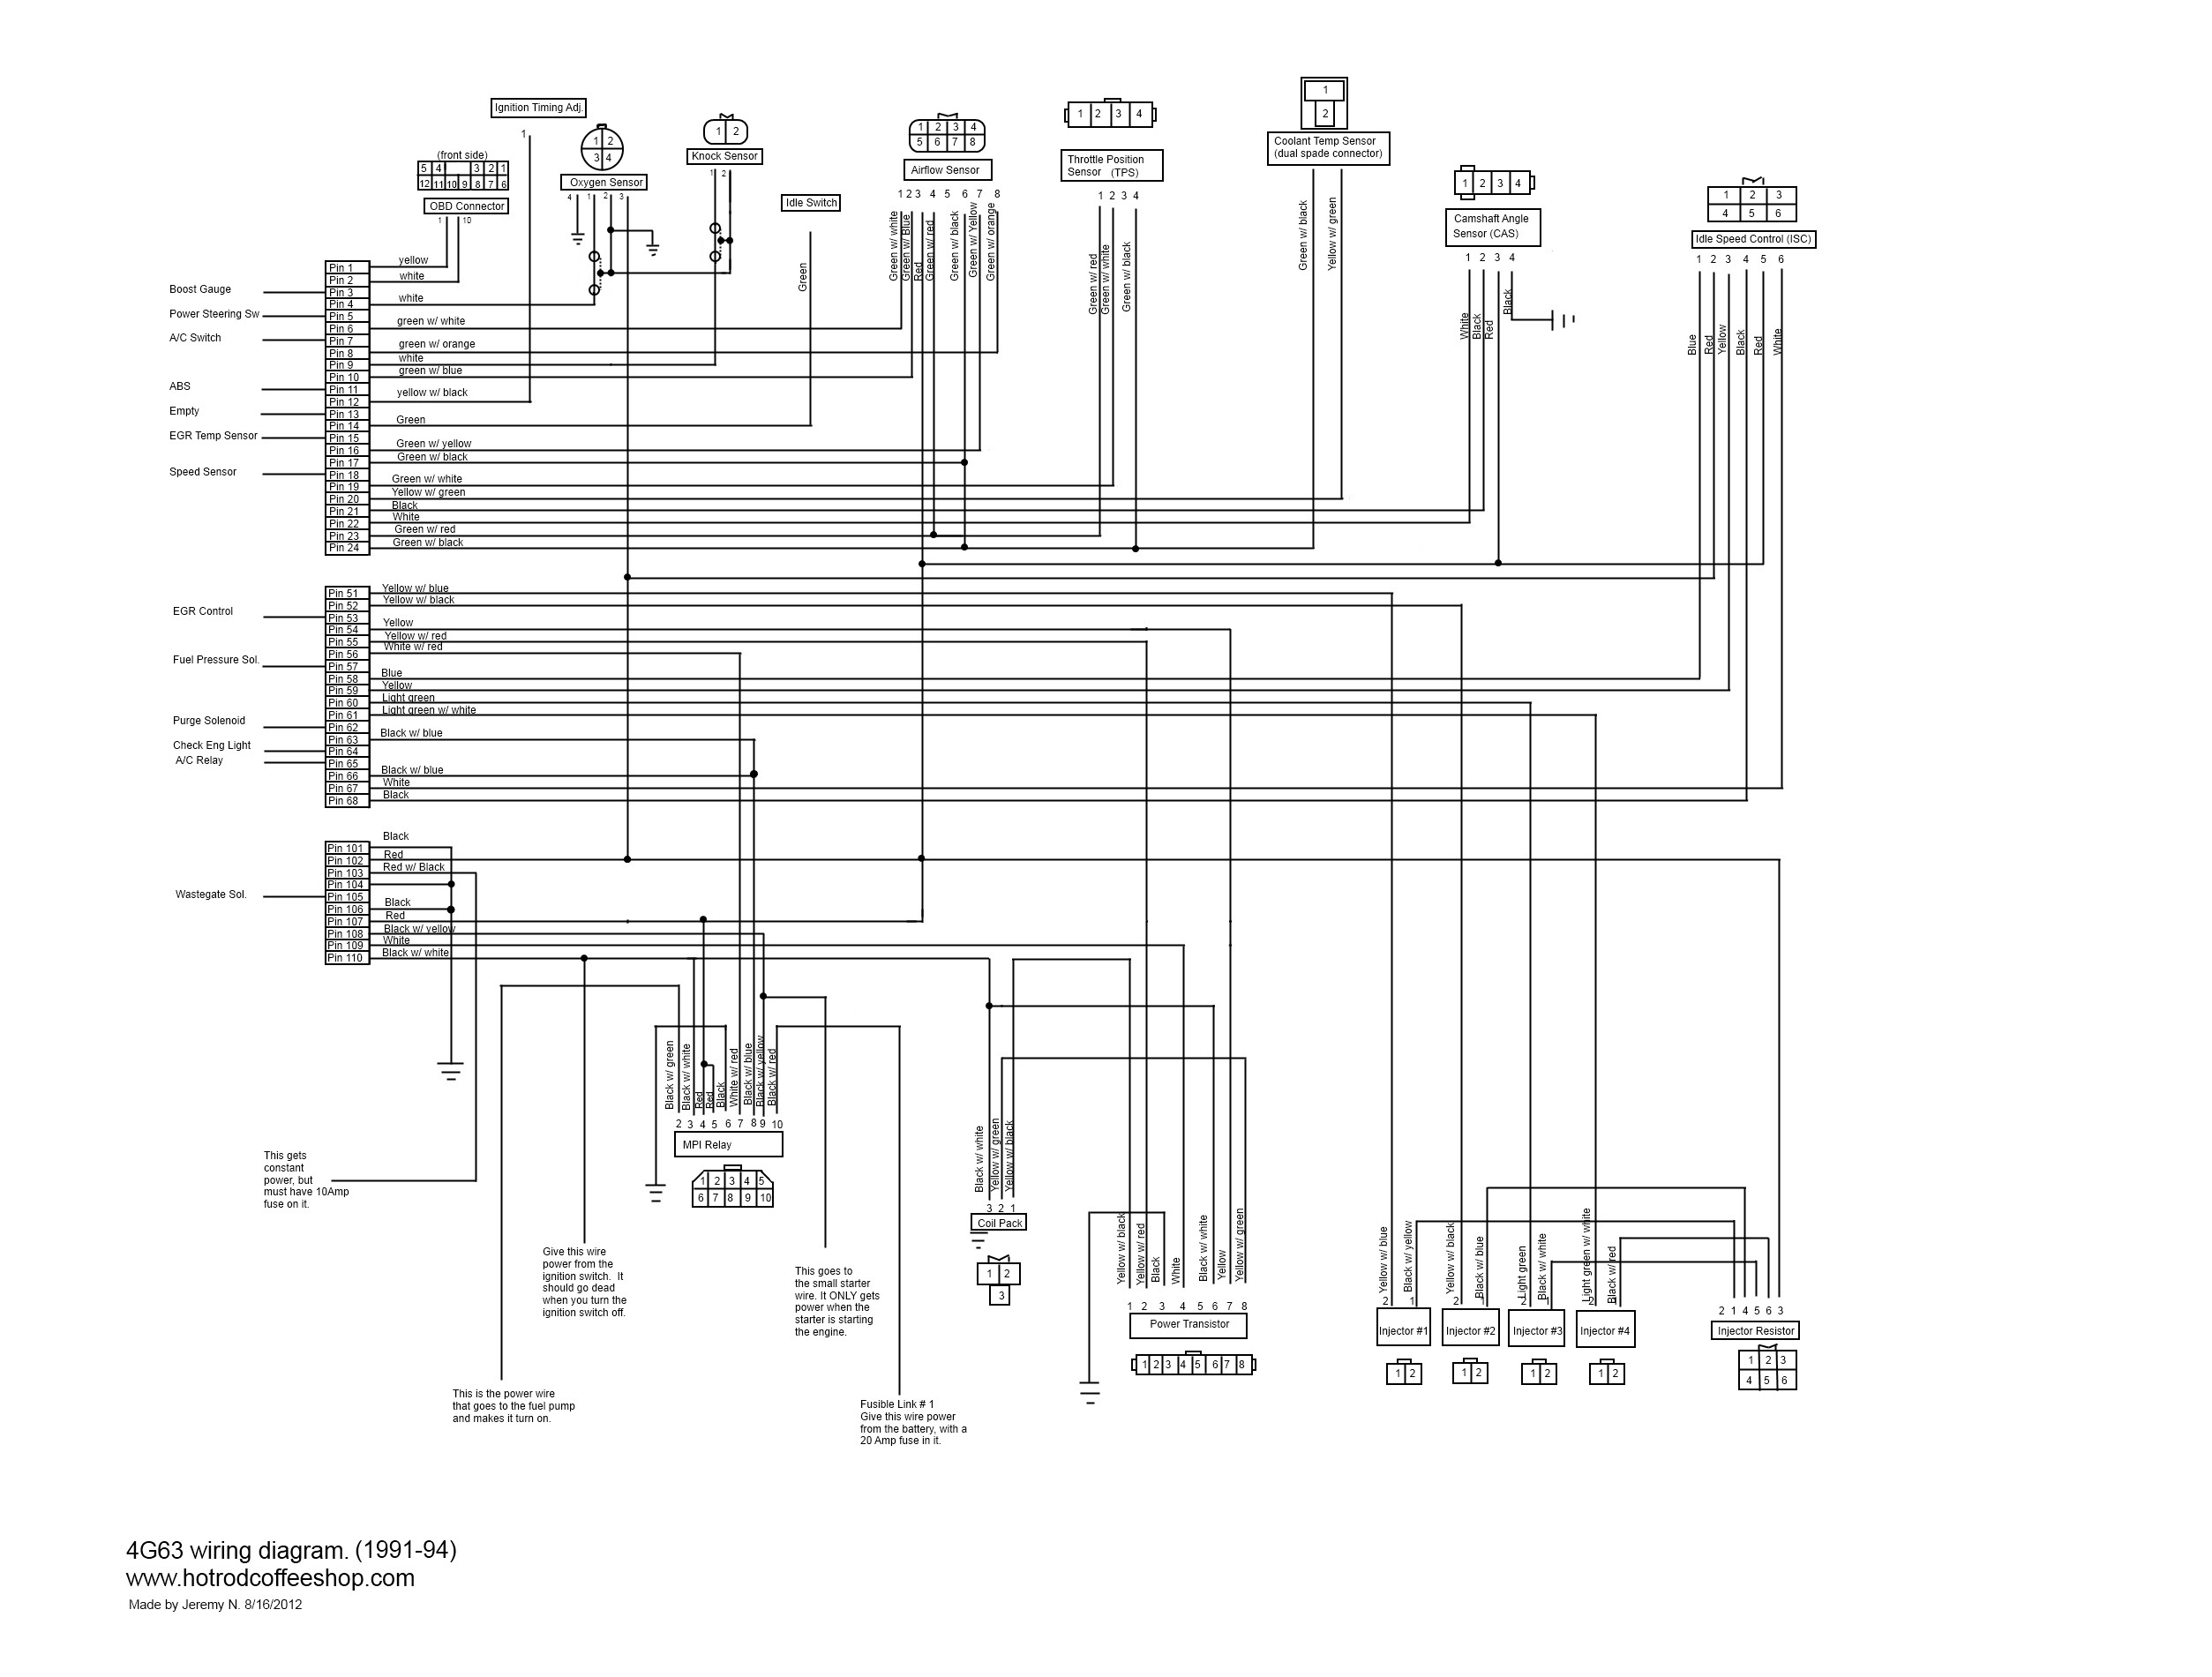 Diagram Mitsubishi Galant 2005 Wiring Diagram Full Version Hd Quality Wiring Diagram Diagramedyep Pcandphone Fr